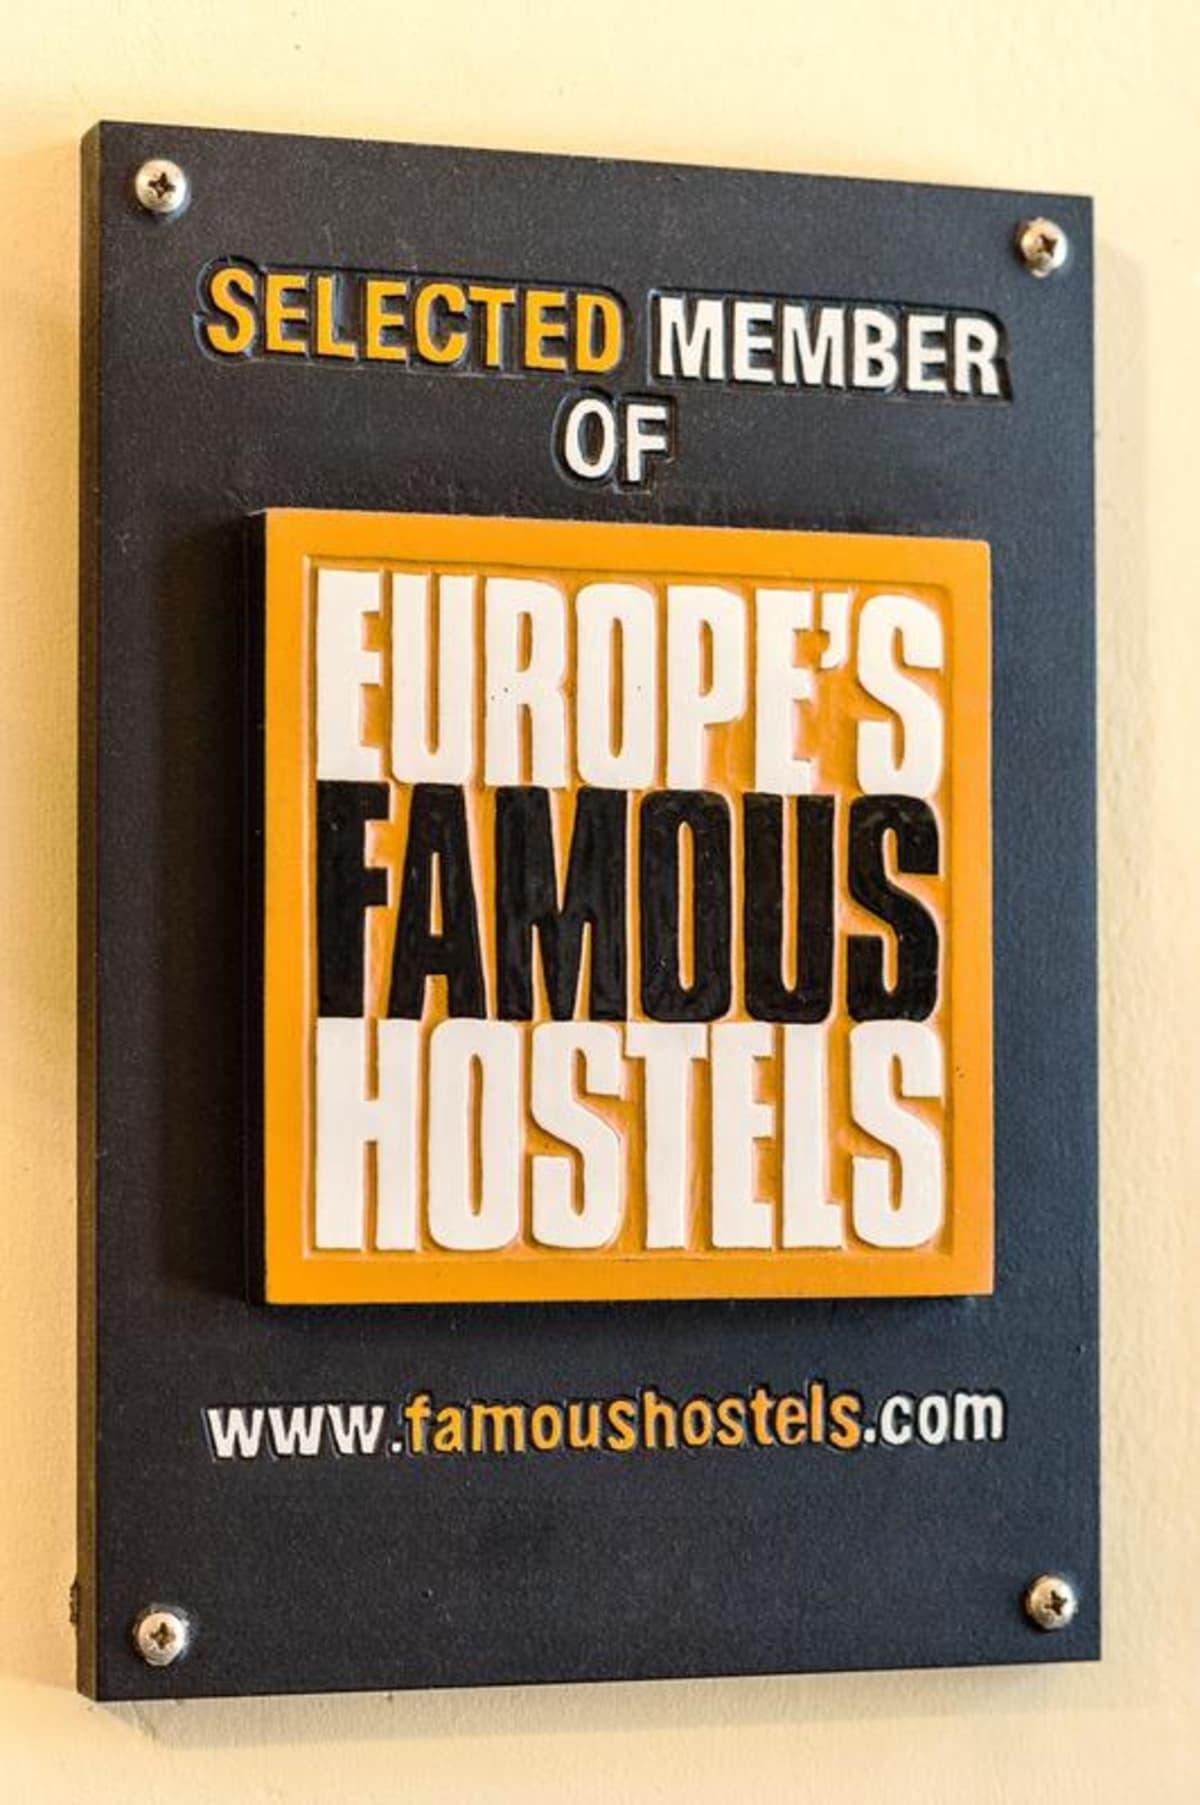 Euro Youth Hostel, Munich, Germany